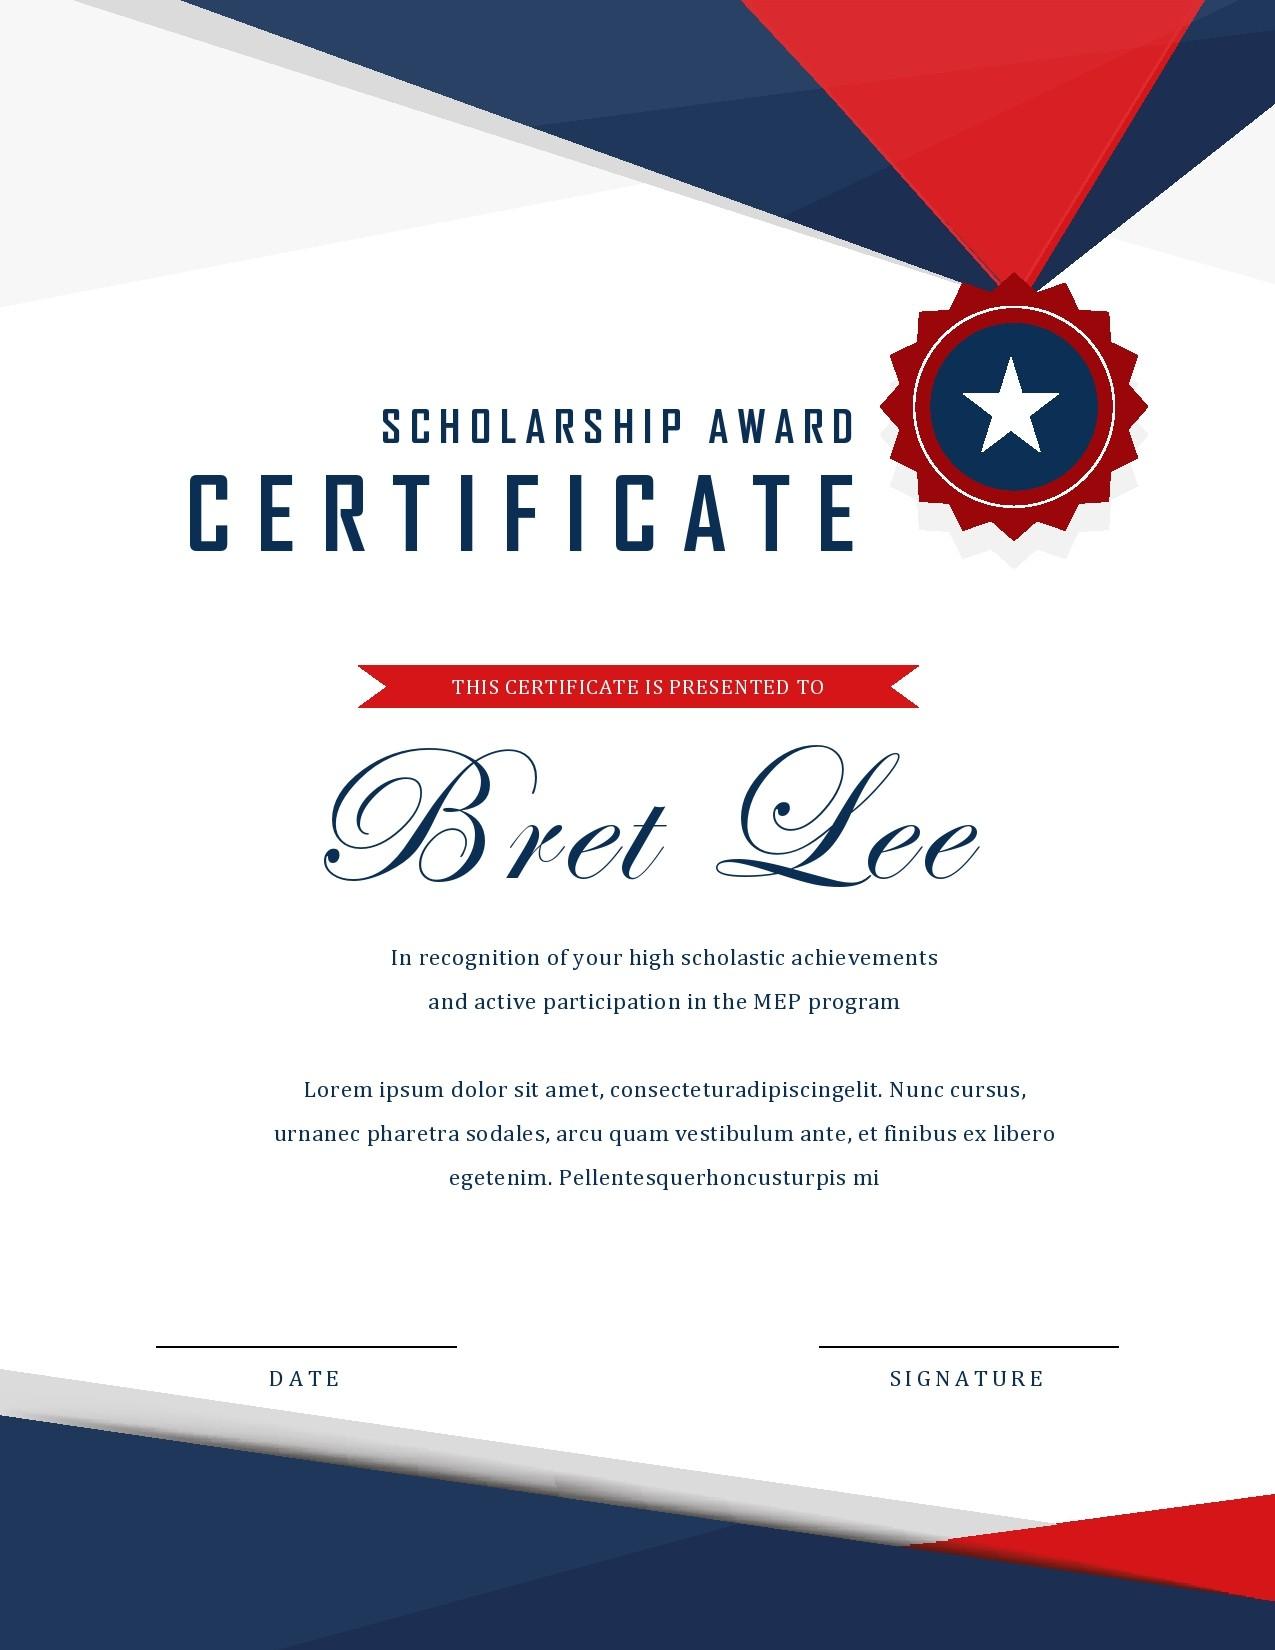 Free scholarship certificate 25